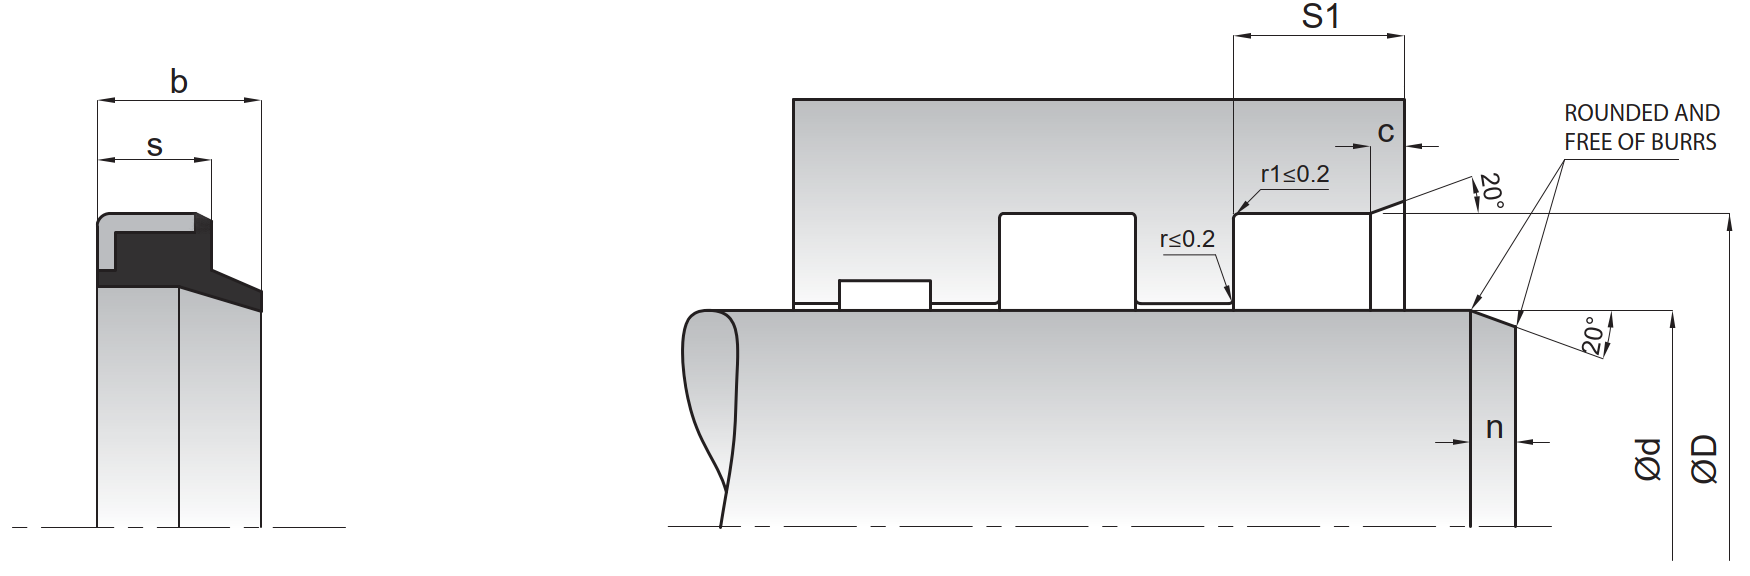 Drawing WS-20